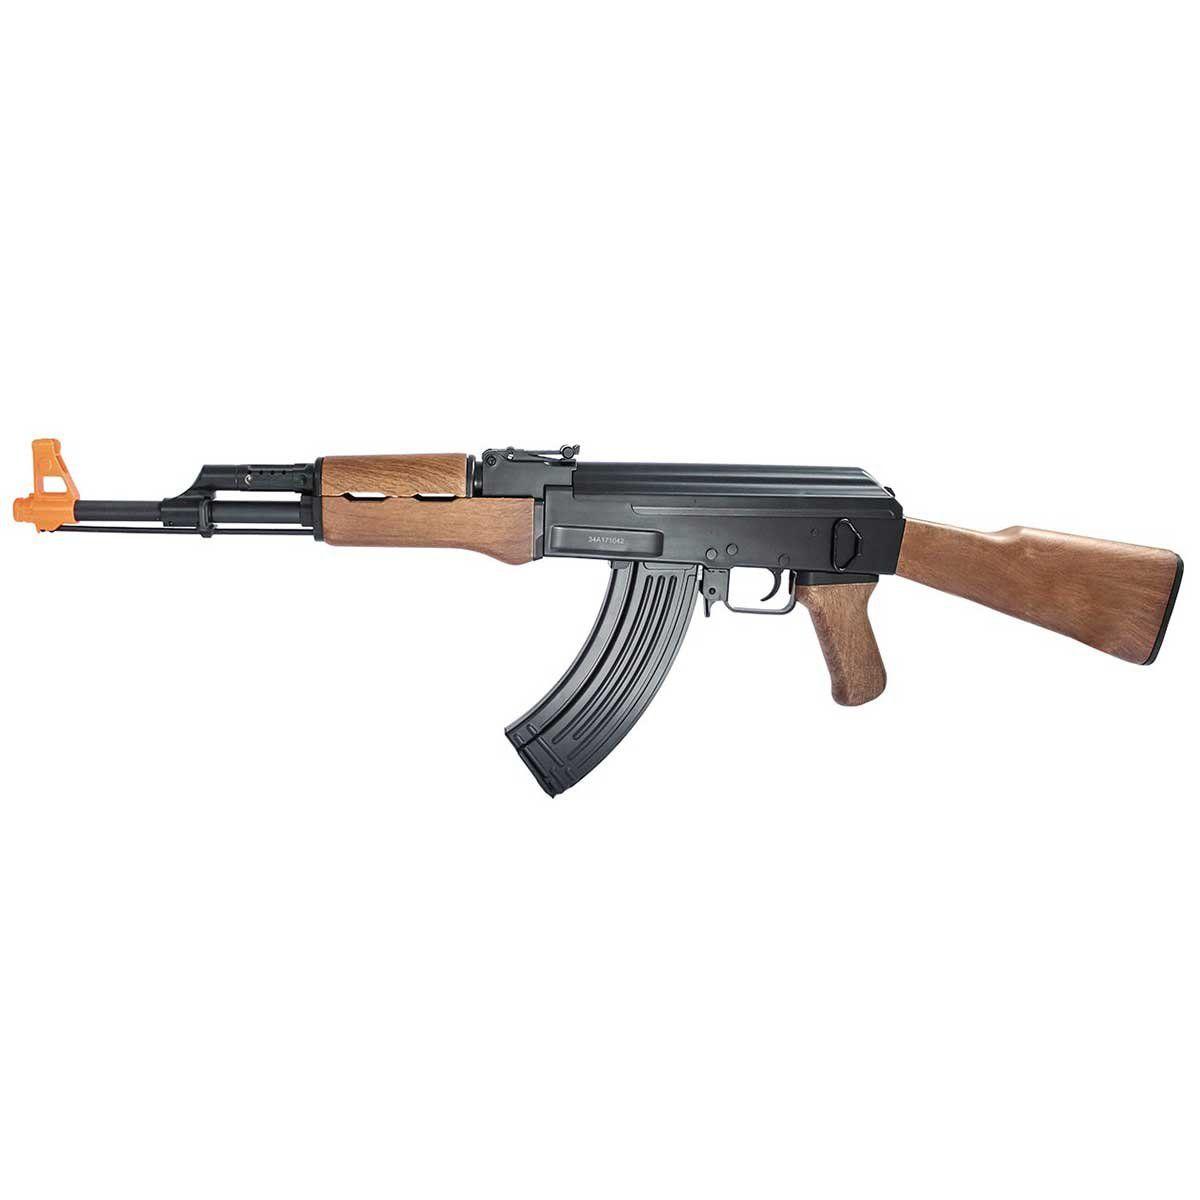 Rifle de Airsoft Cyma AK47 CM522 Elétrico Bivolt 6mm